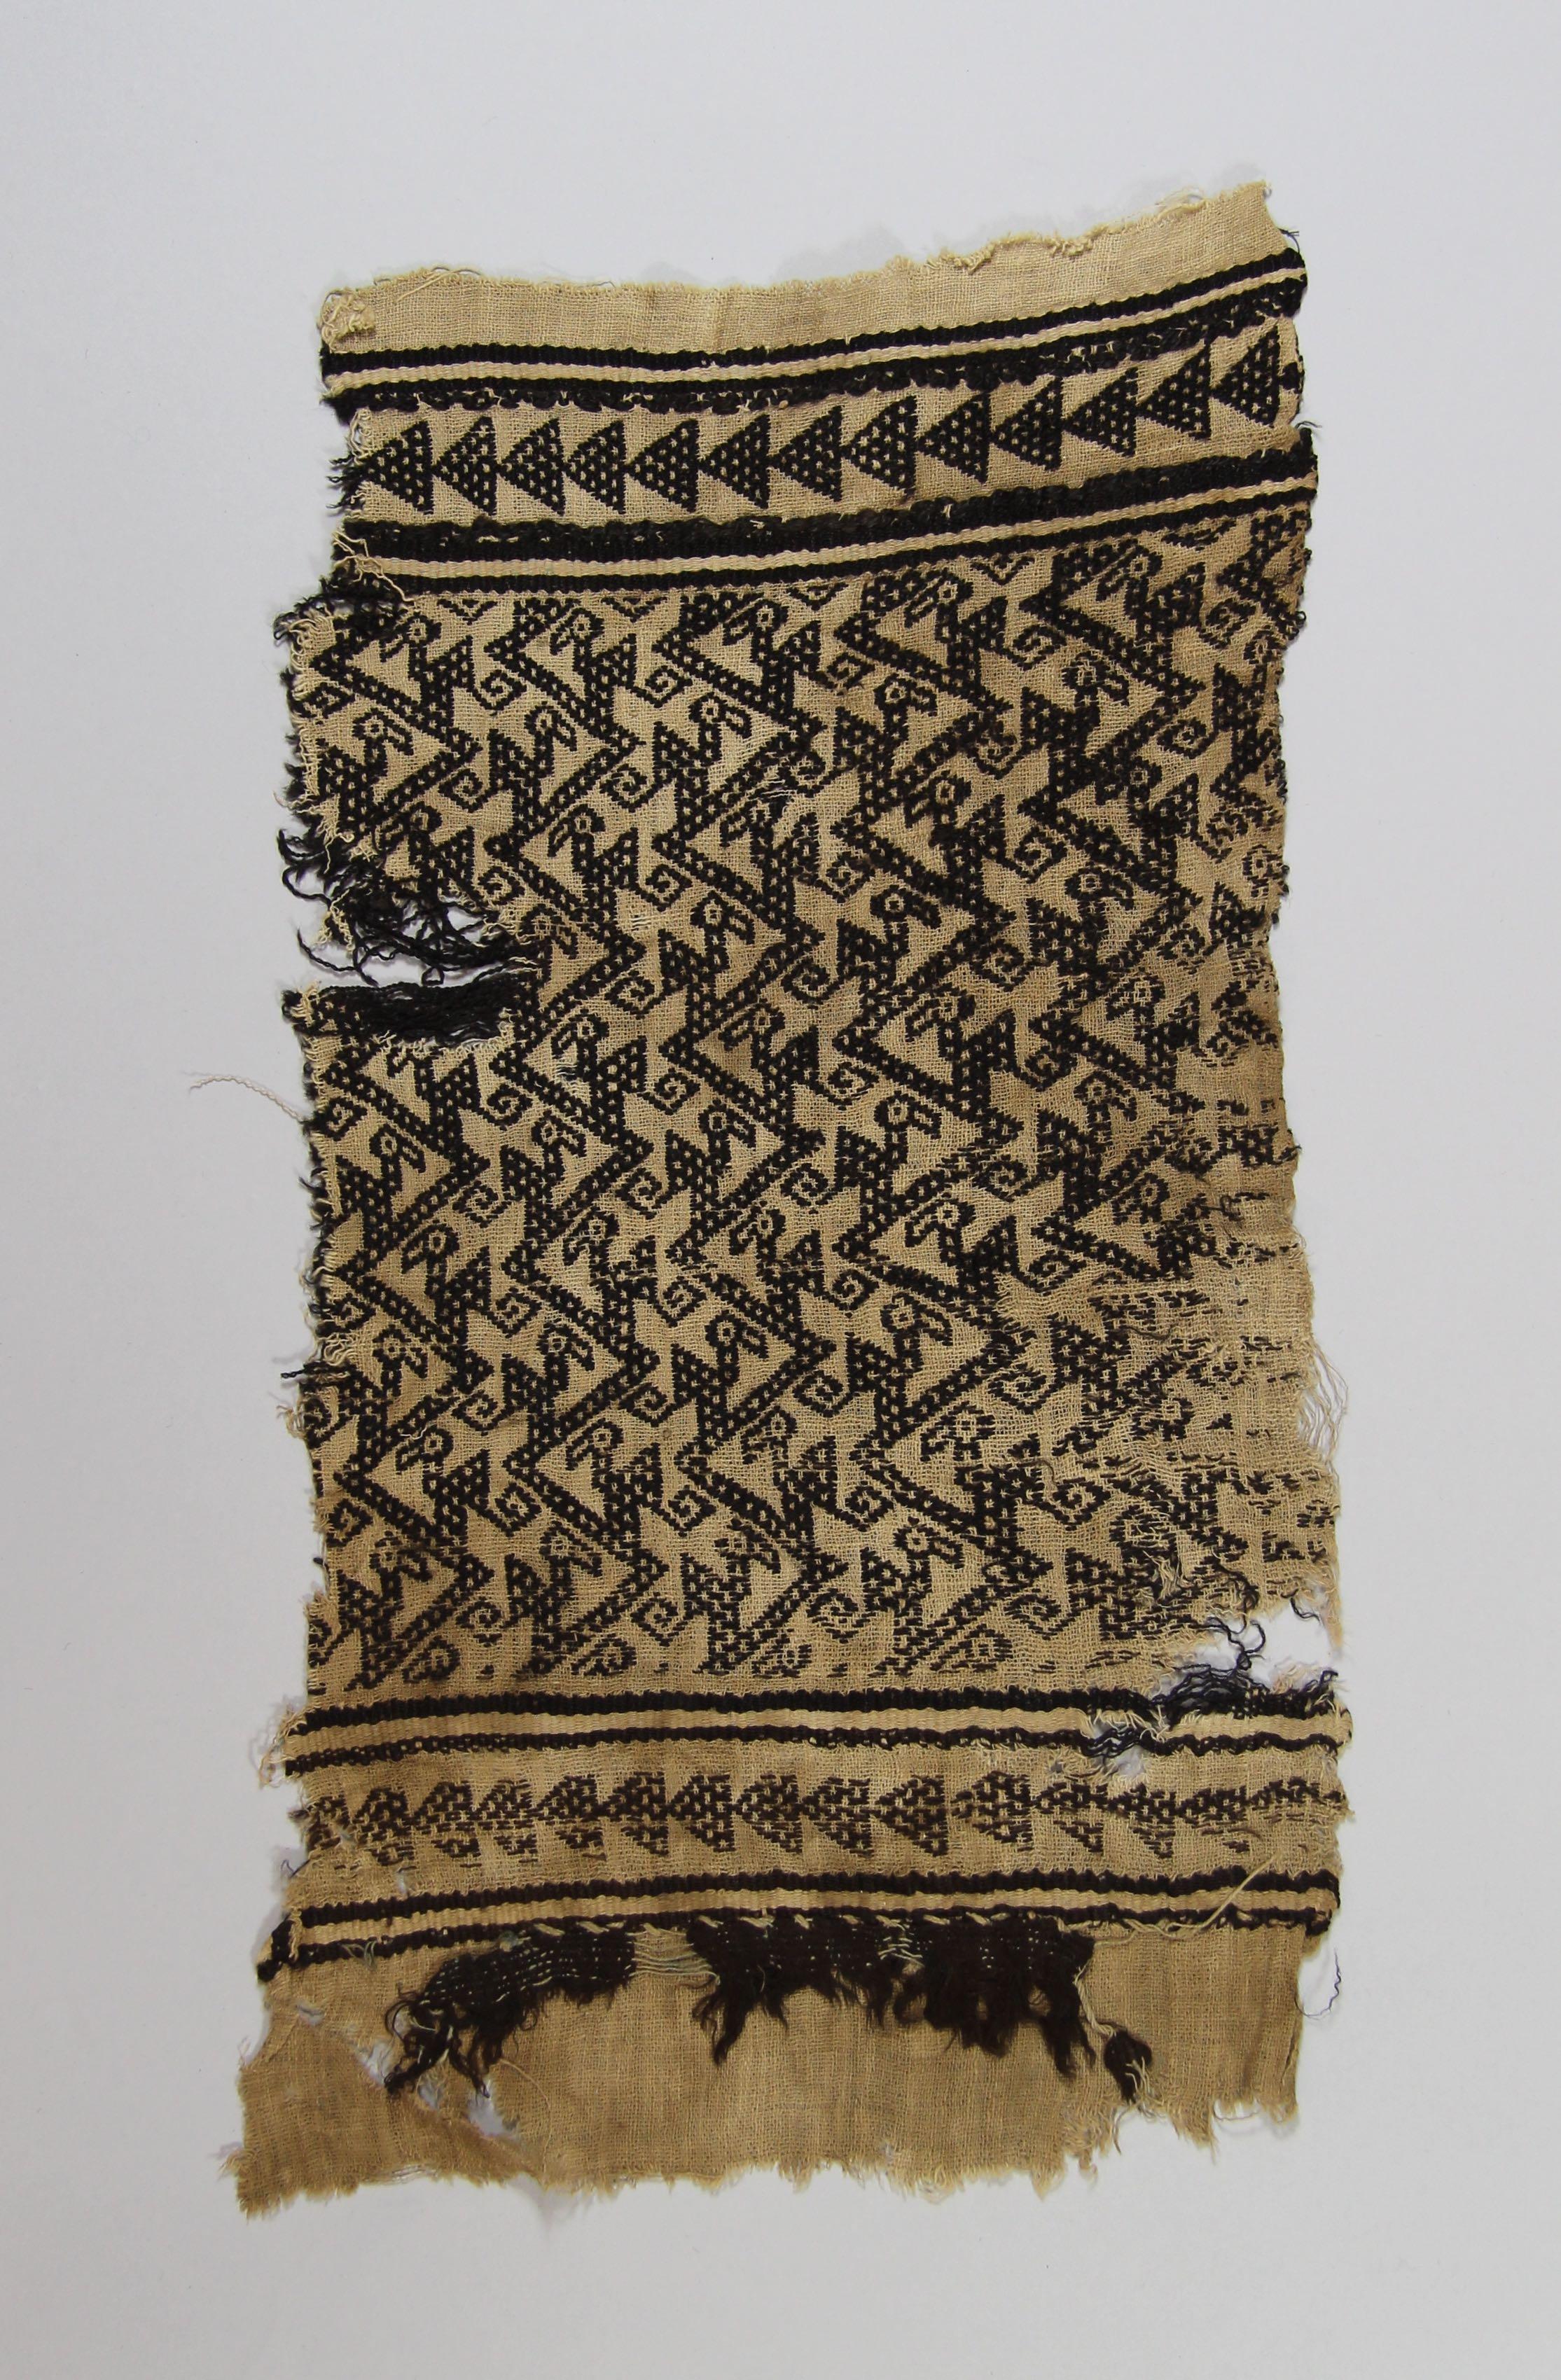 Woven textile (fragment)